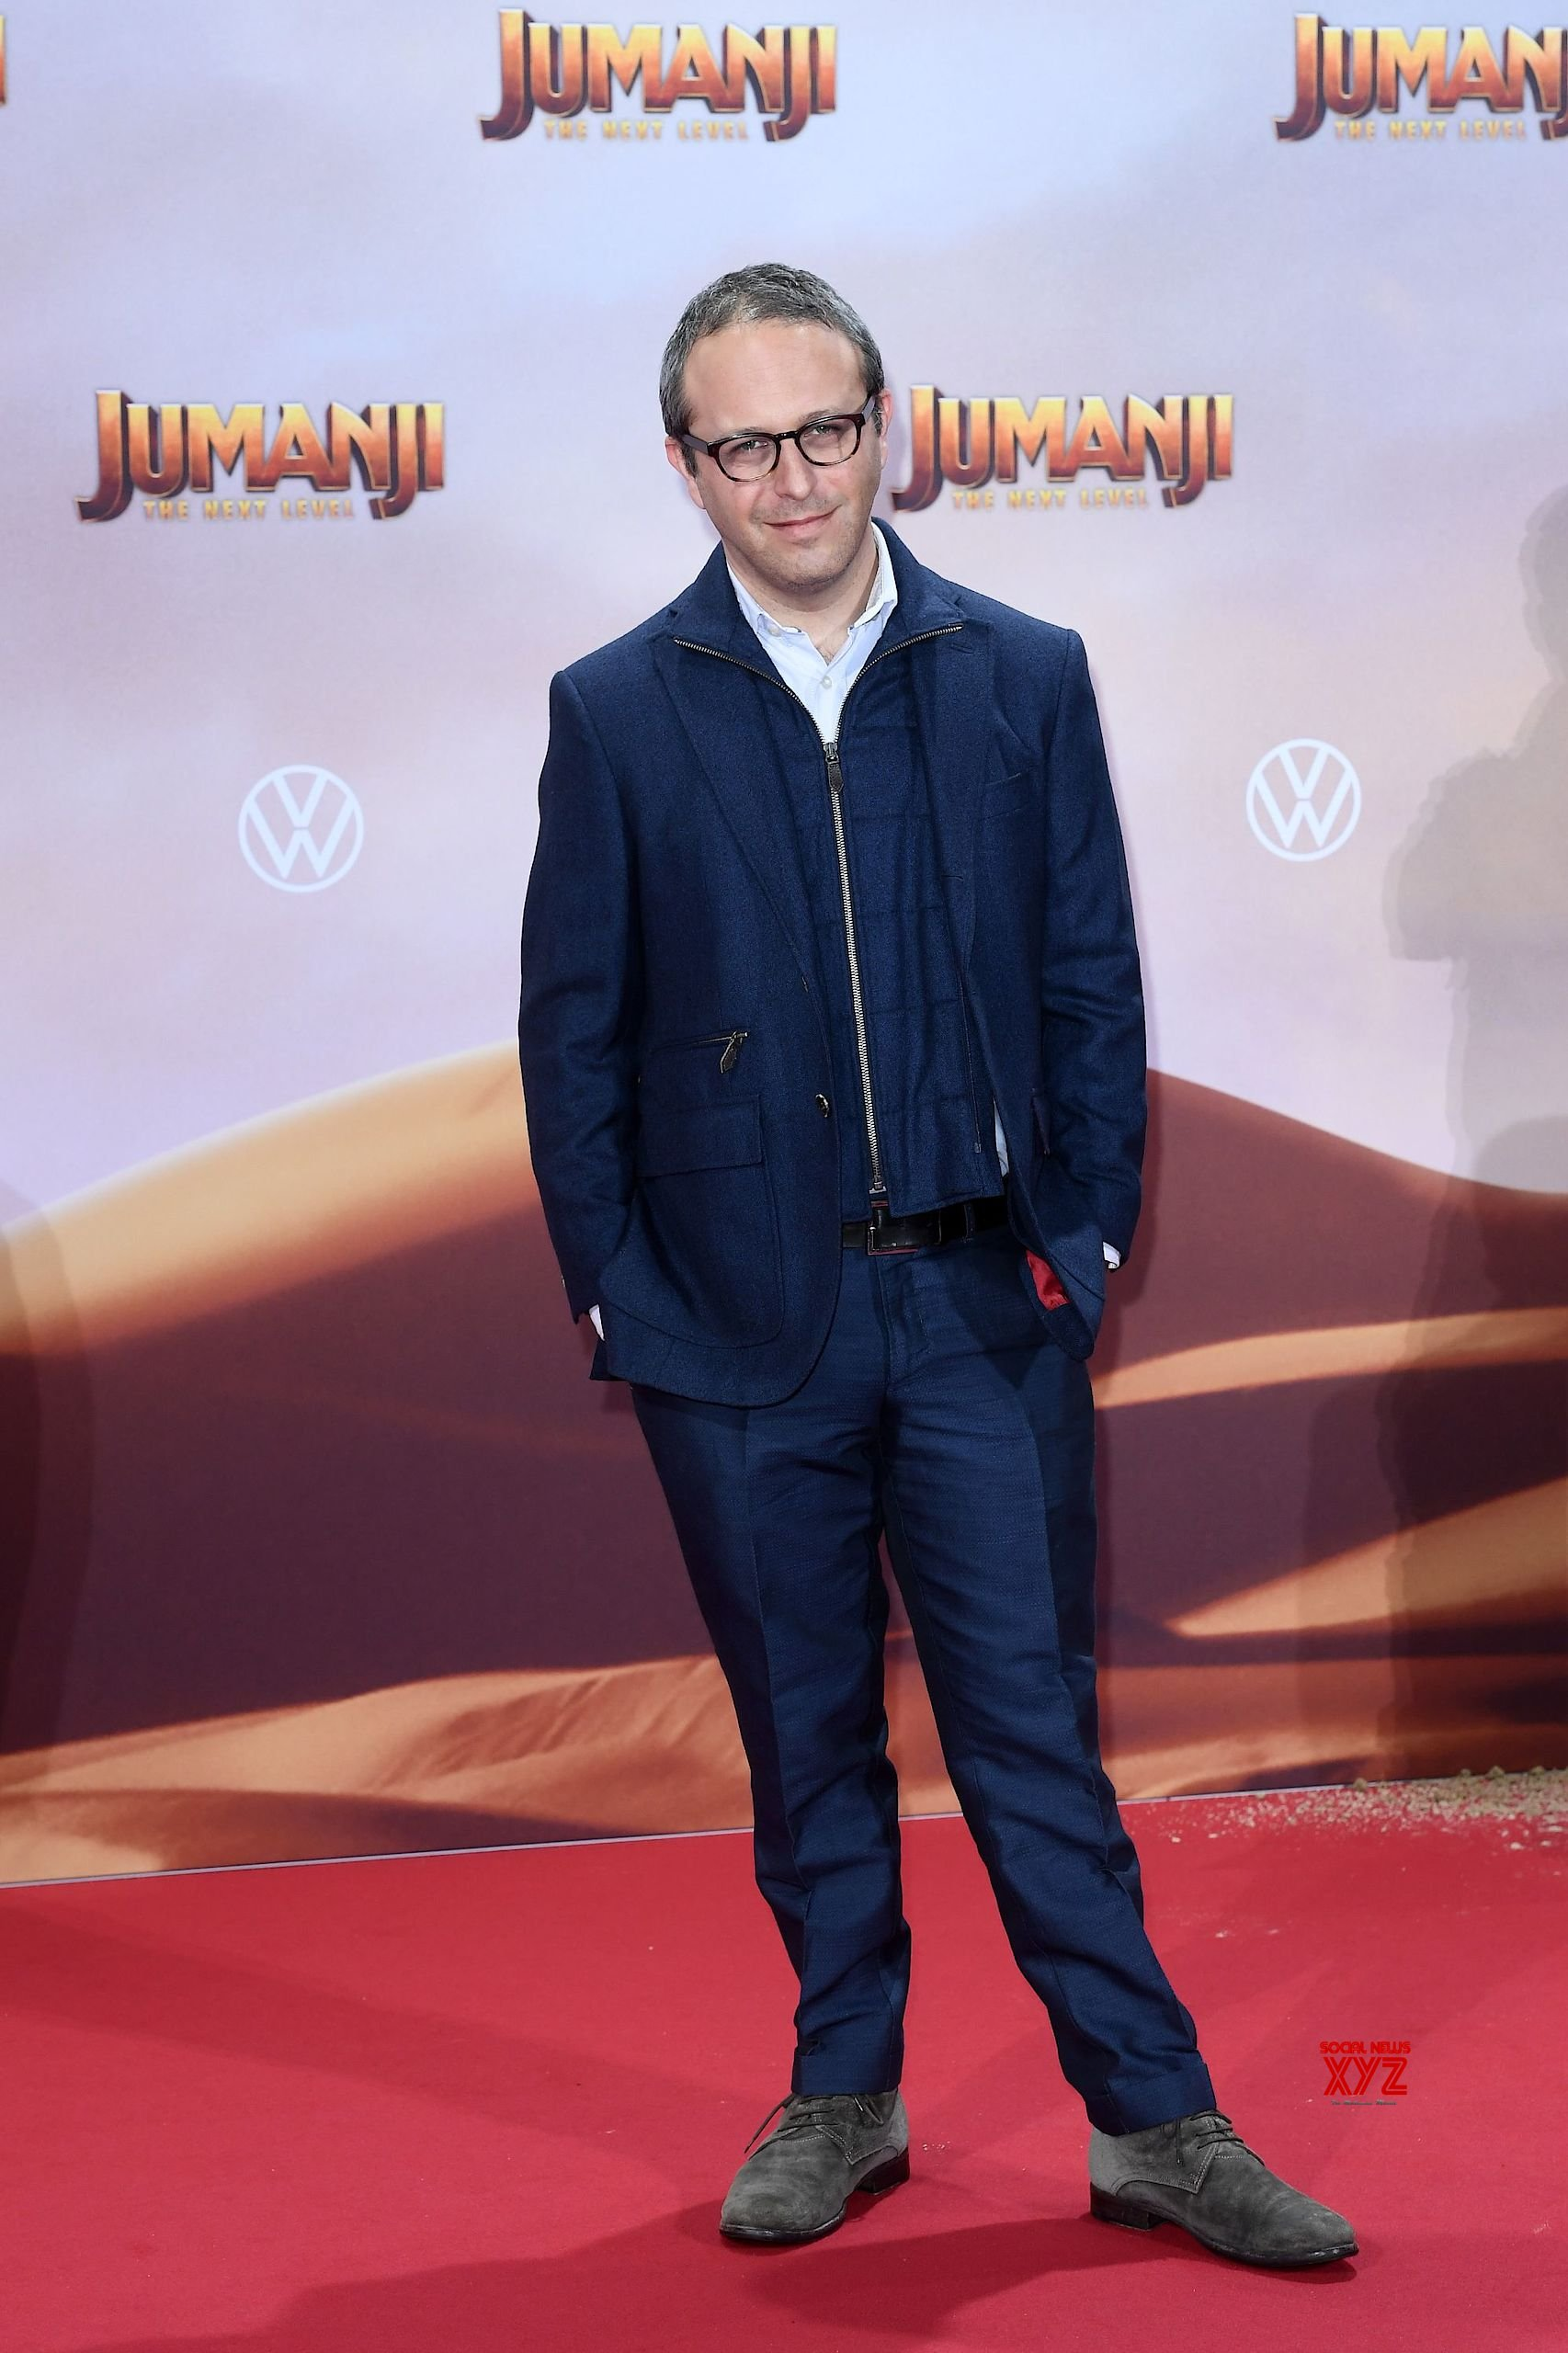 Jumanji: The Next Level Movie Berlin Premiere HD Gallery